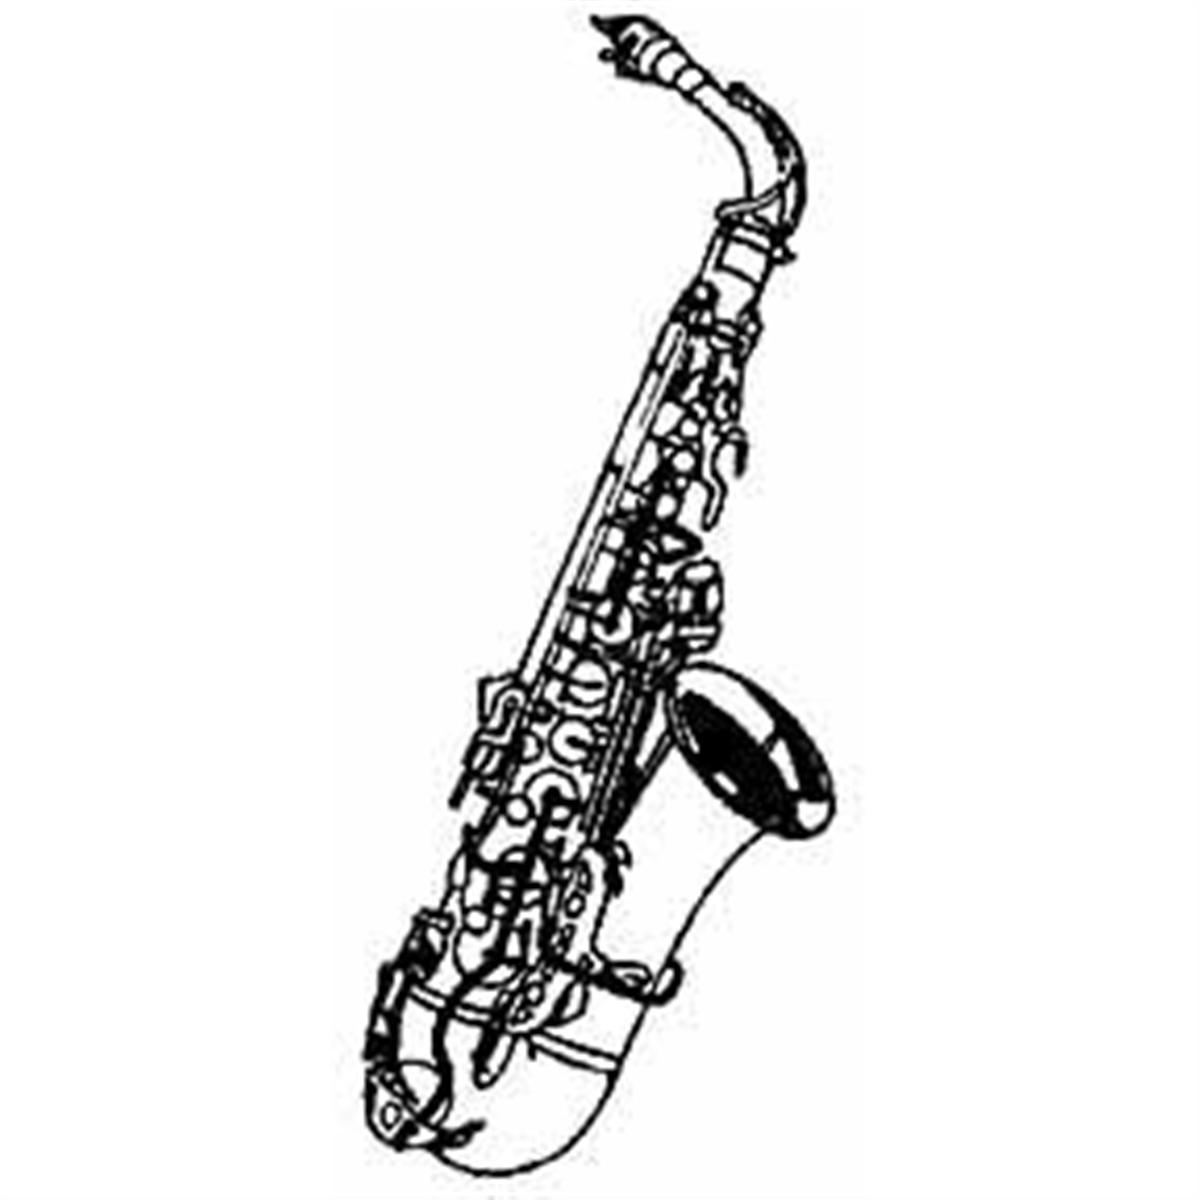 Alto saxophone clipart.